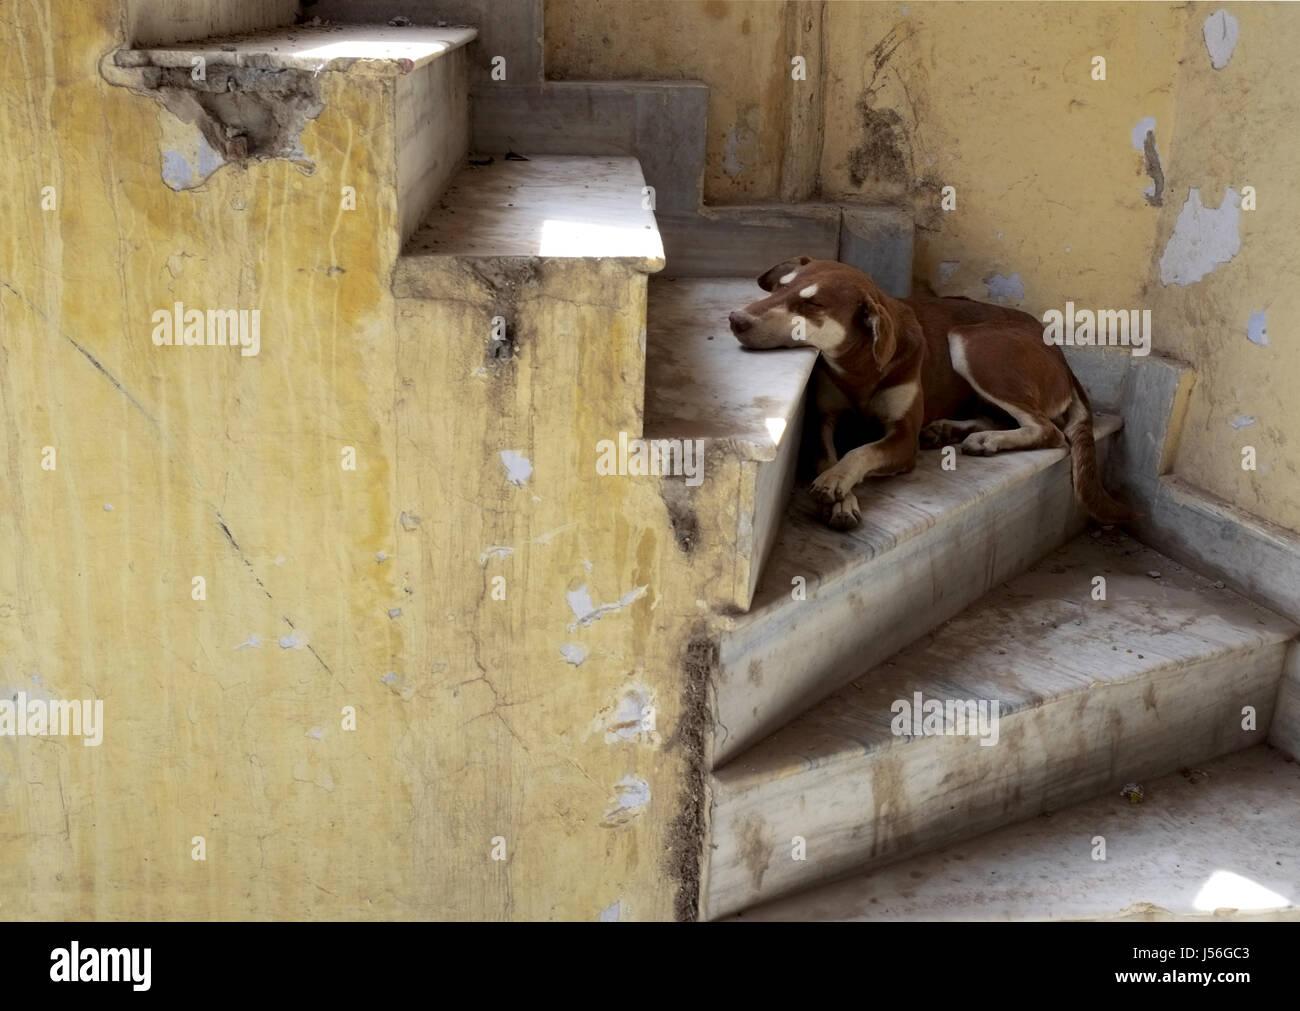 Dog sleeping in ruined temple, Amritsar, Punjab - Stock Image